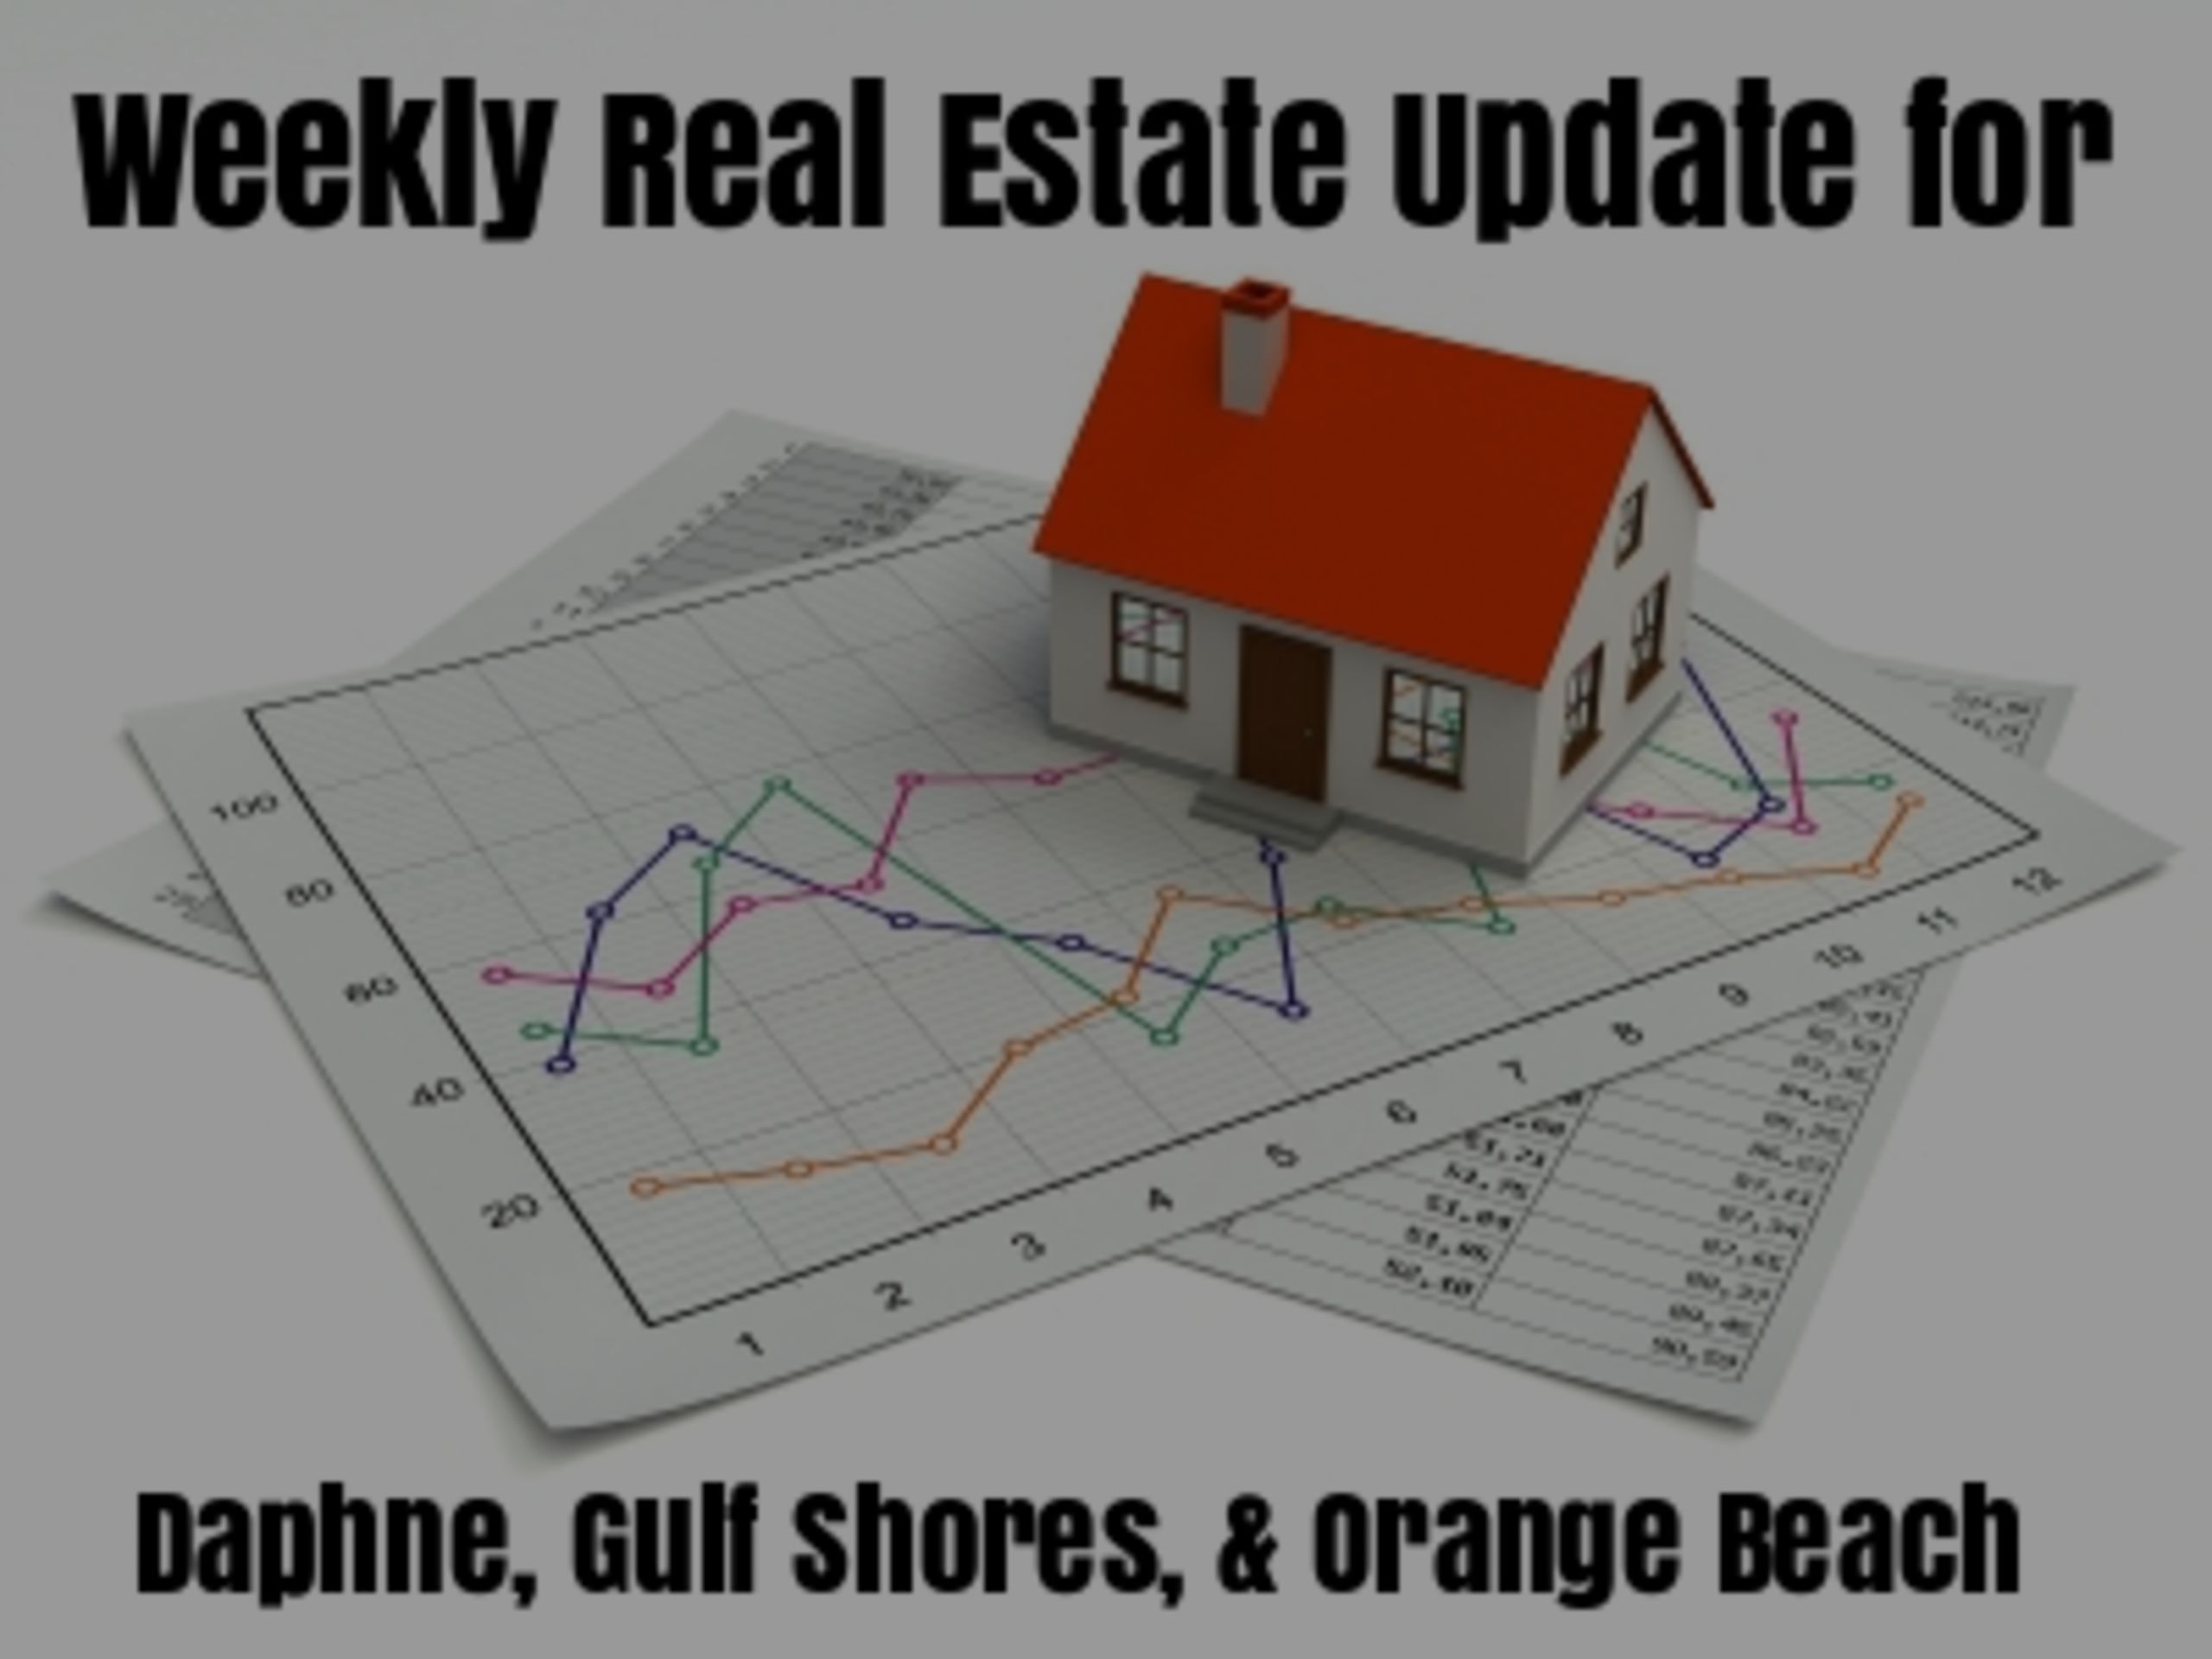 Weekly Real Estate Update – Daphne, Gulf Shores, and Orange Beach – 7/31/17